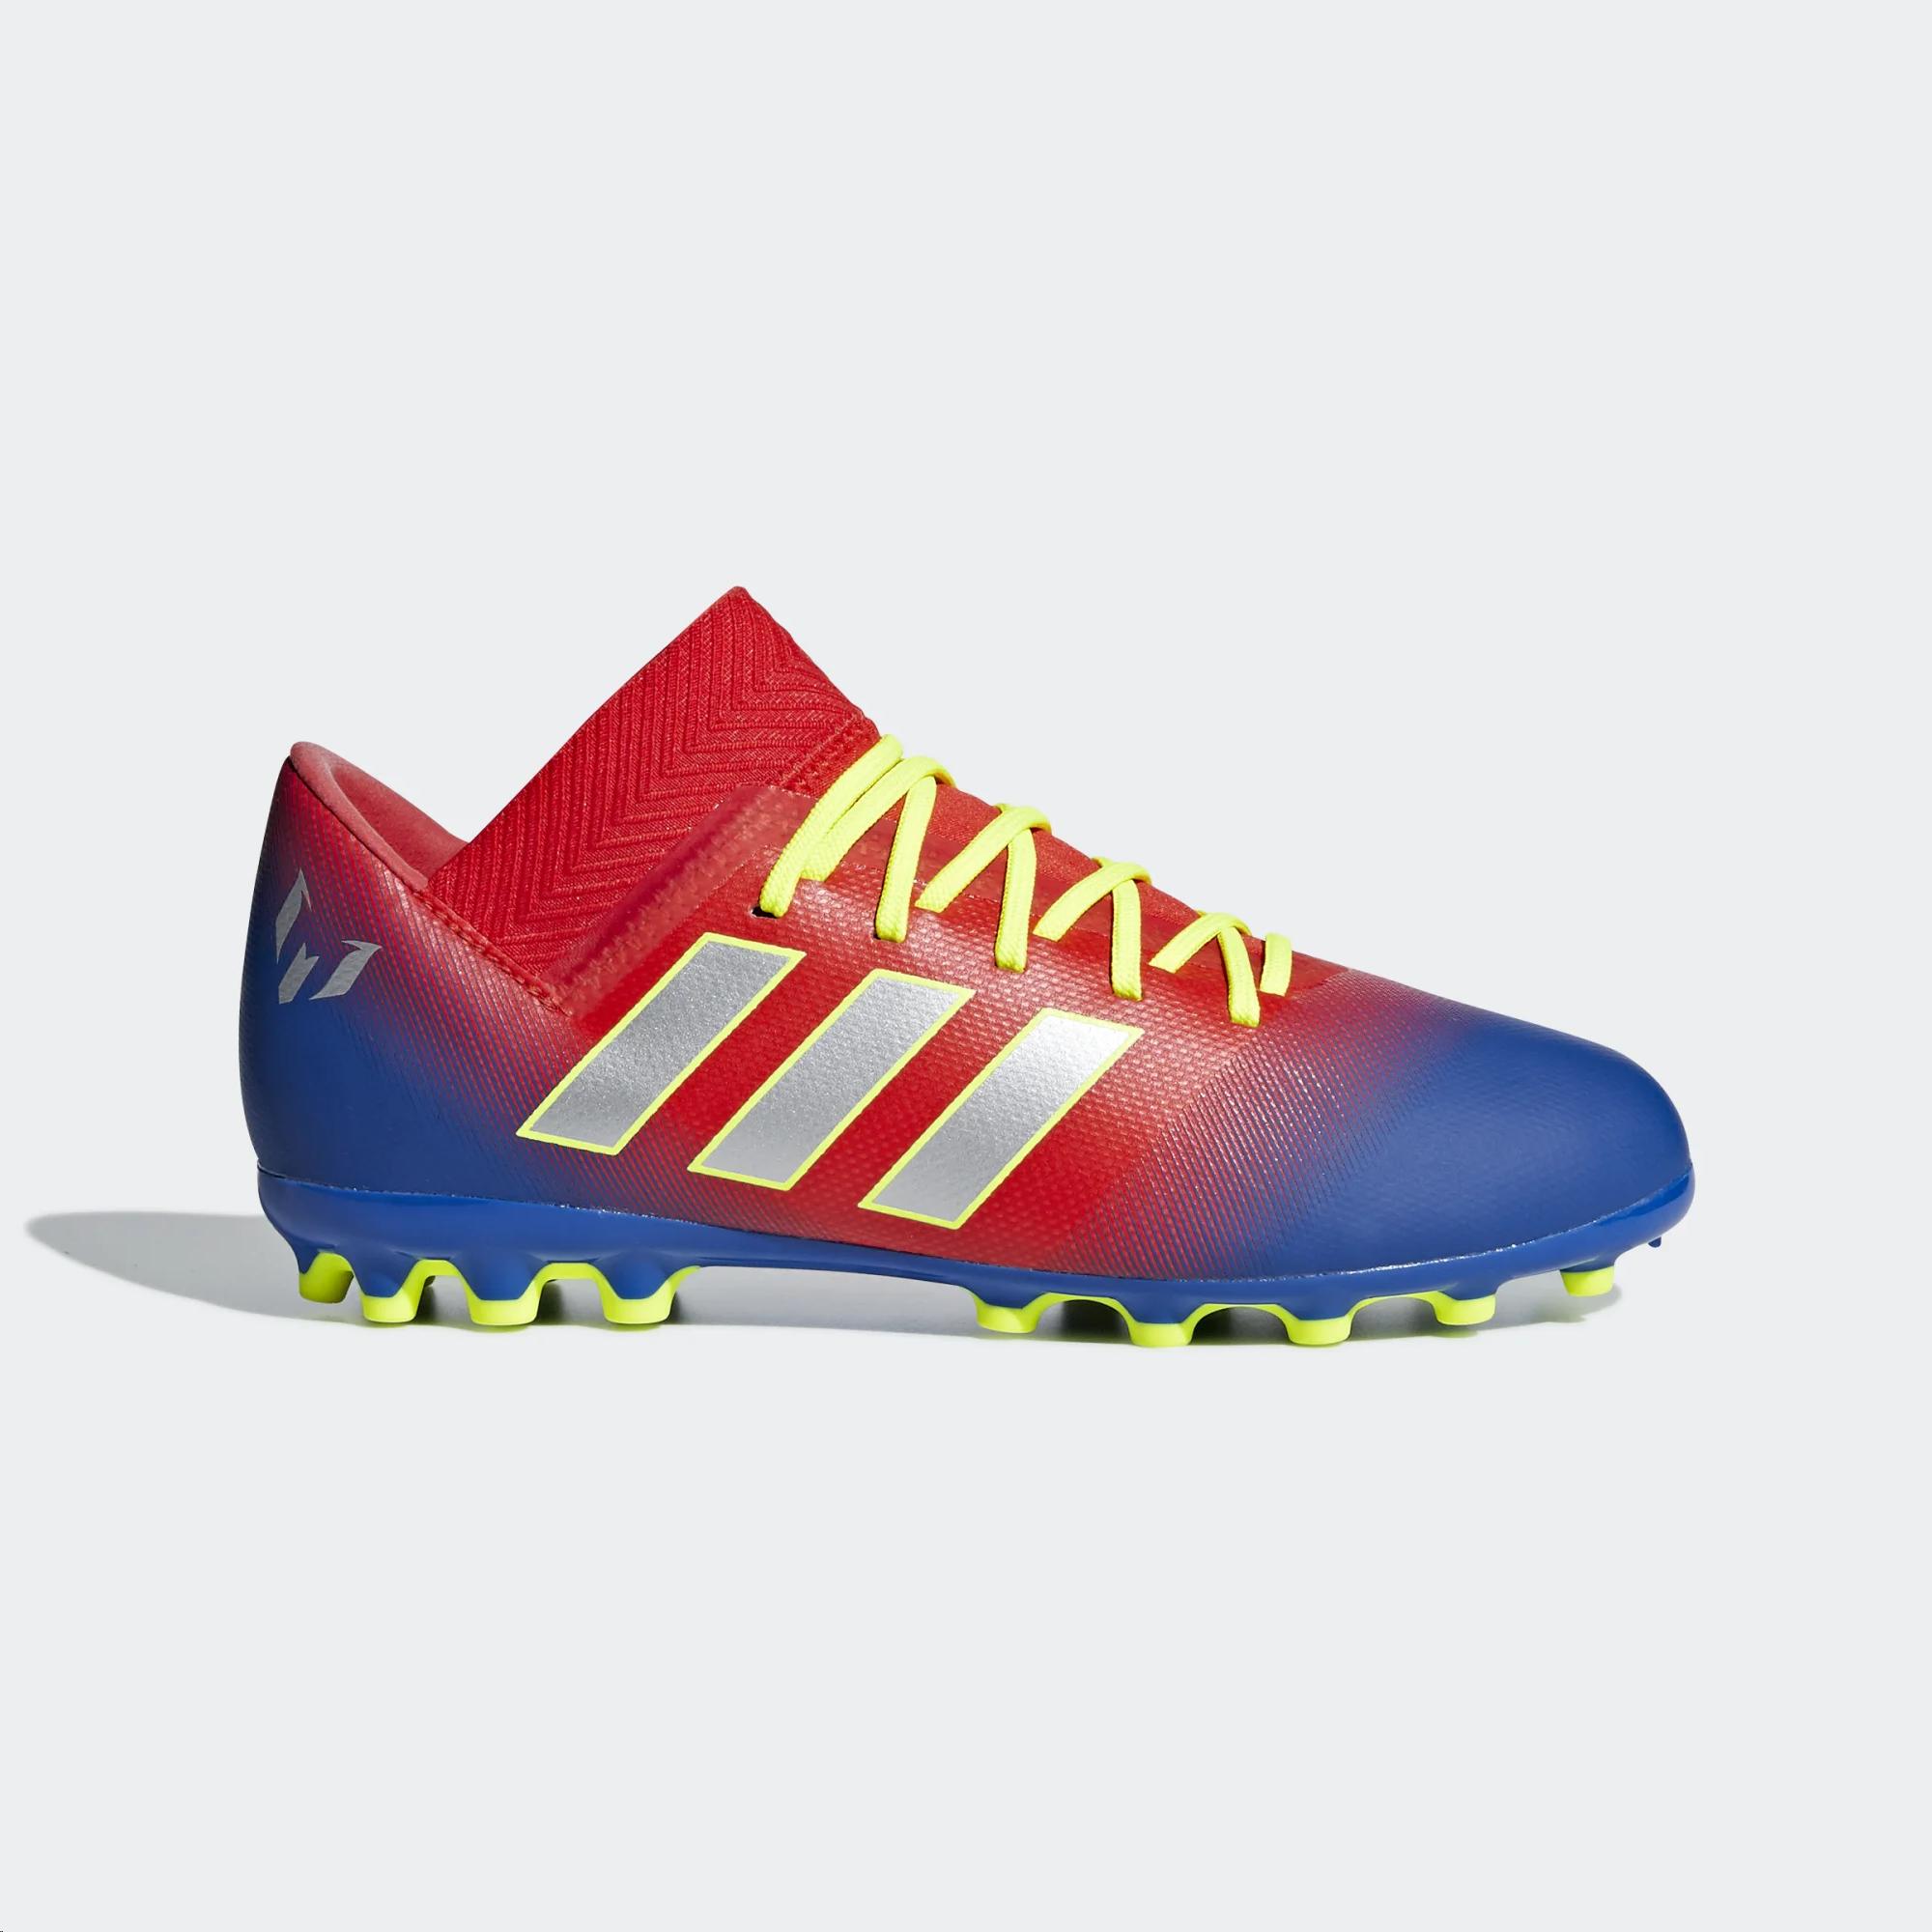 Zapatillas fútbol adidas Nemeziz Messi 18.3 AG rojoazul jr